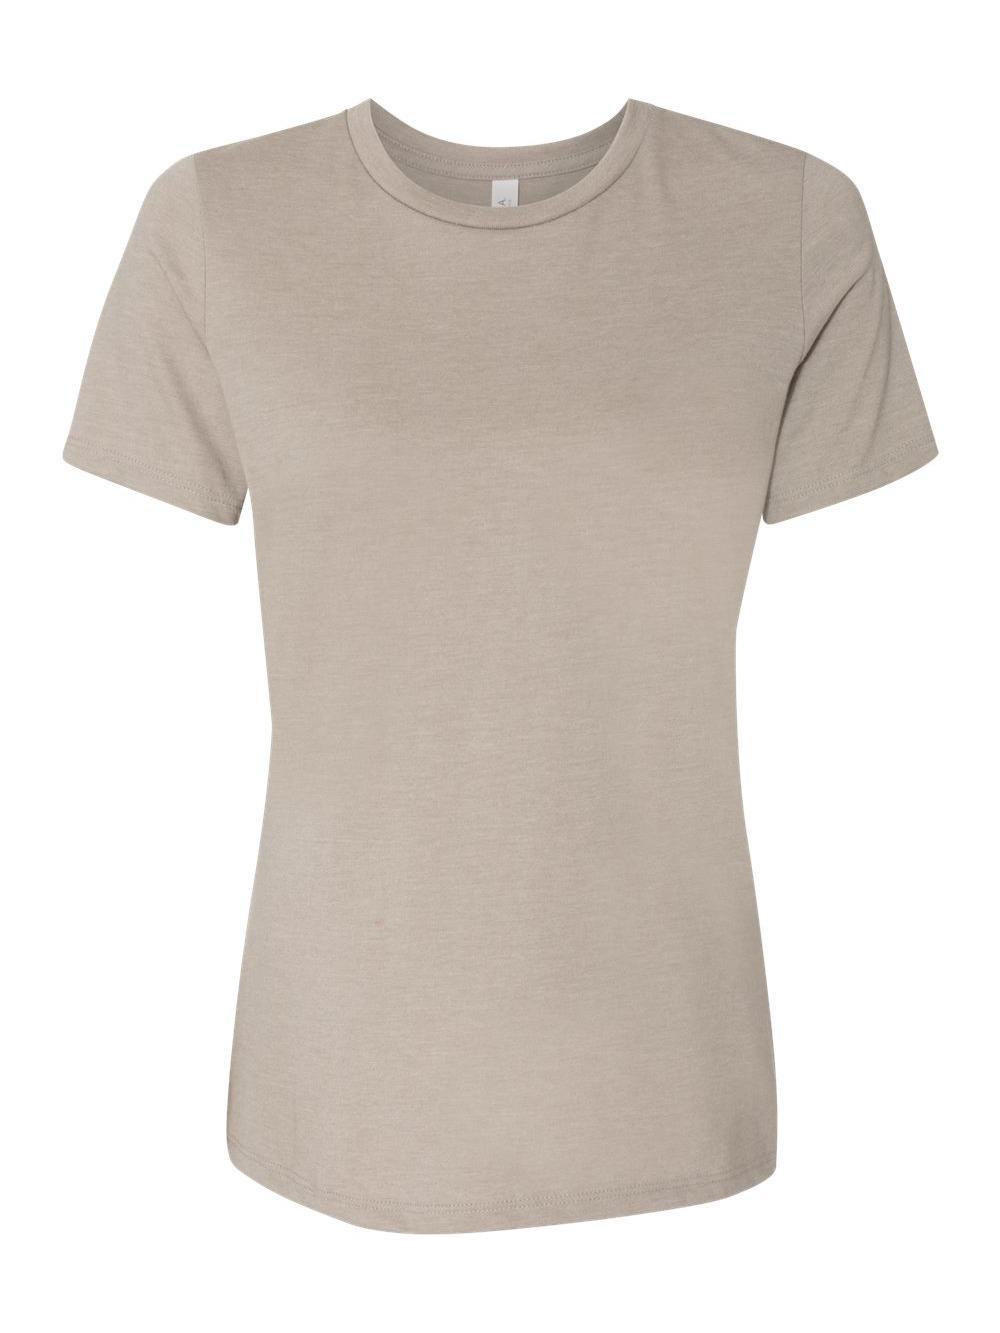 Bella-Canvas-Women-039-s-Relaxed-Short-Sleeve-Jersey-Tee-6400 thumbnail 51